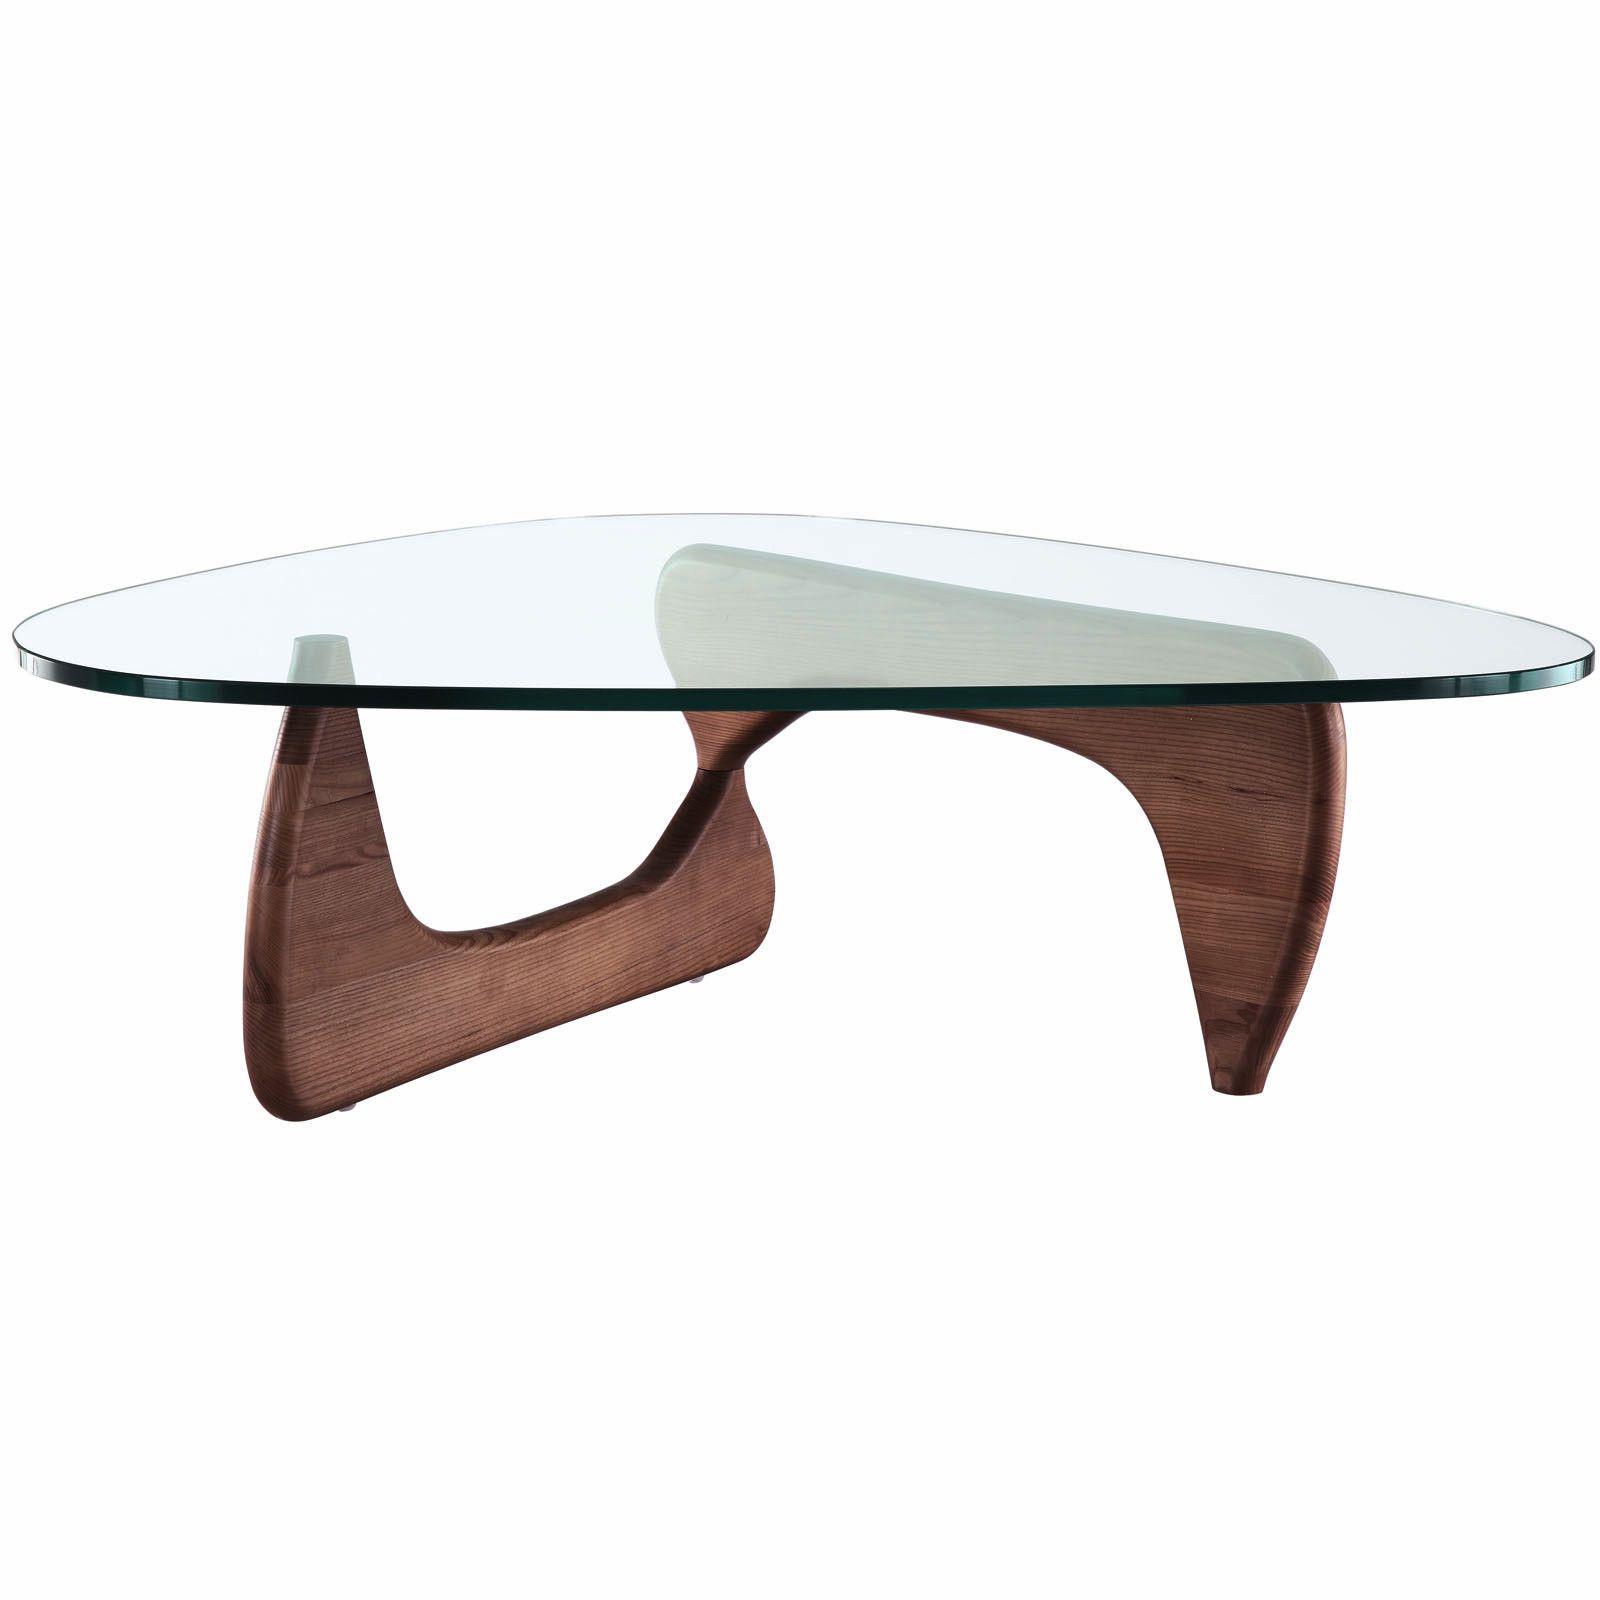 Emod Noguchi Style Coffee Table Reproduction Style Replica Glass Top Wood Walnut Ebay Coffee Table Triangle Coffee Table Glass Top [ 1600 x 1600 Pixel ]